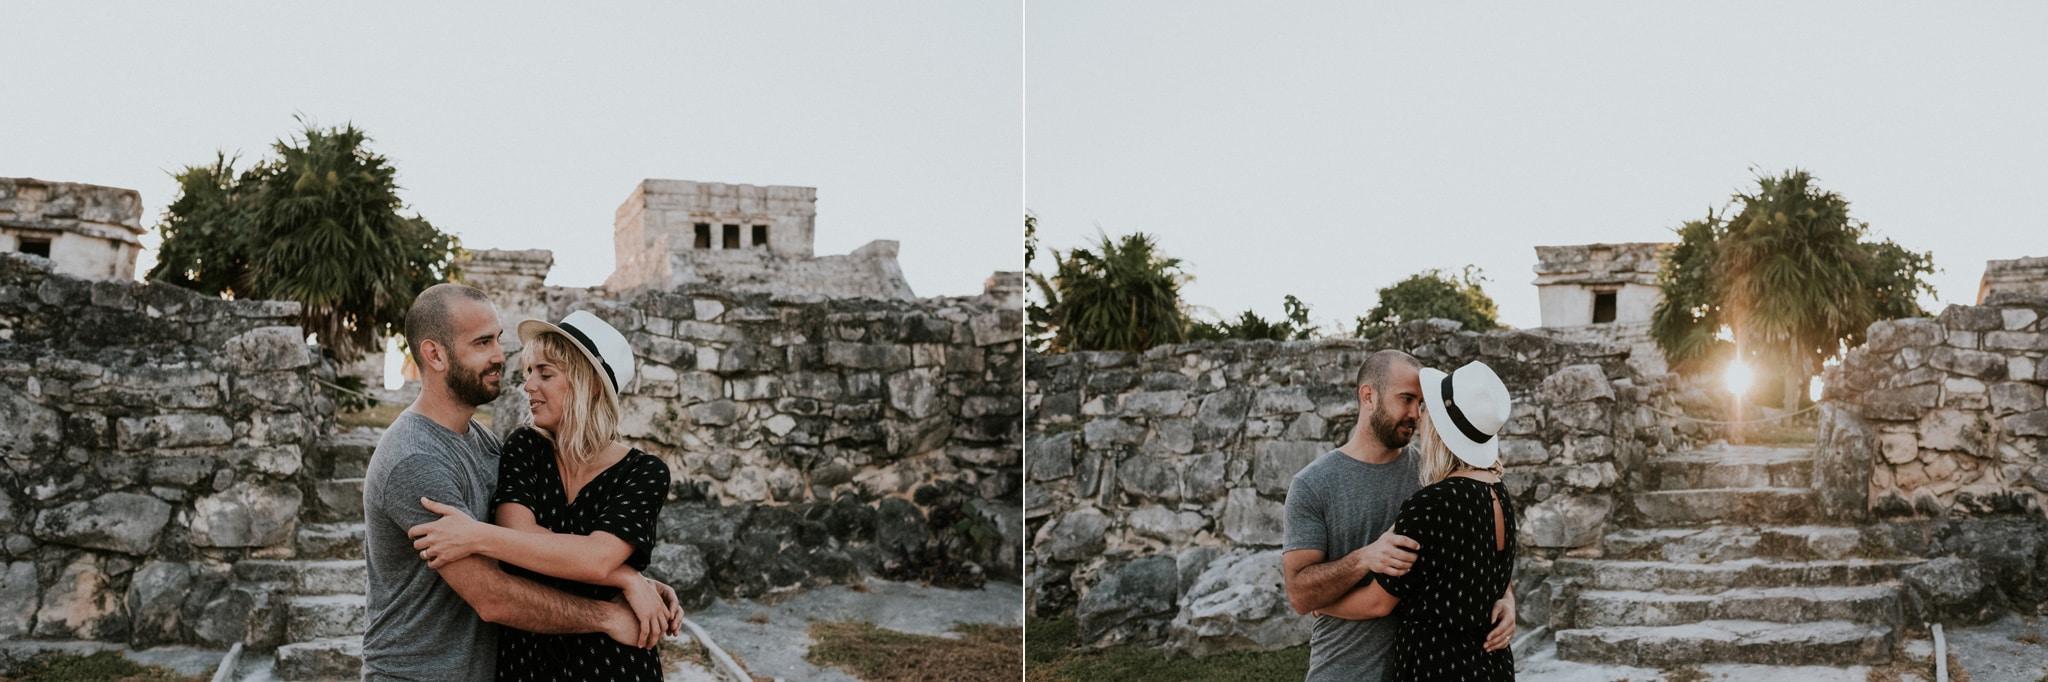 sunrise couples session Quintana Roo, Mexico, Tulum Wedding Photographer Marcela Pulido